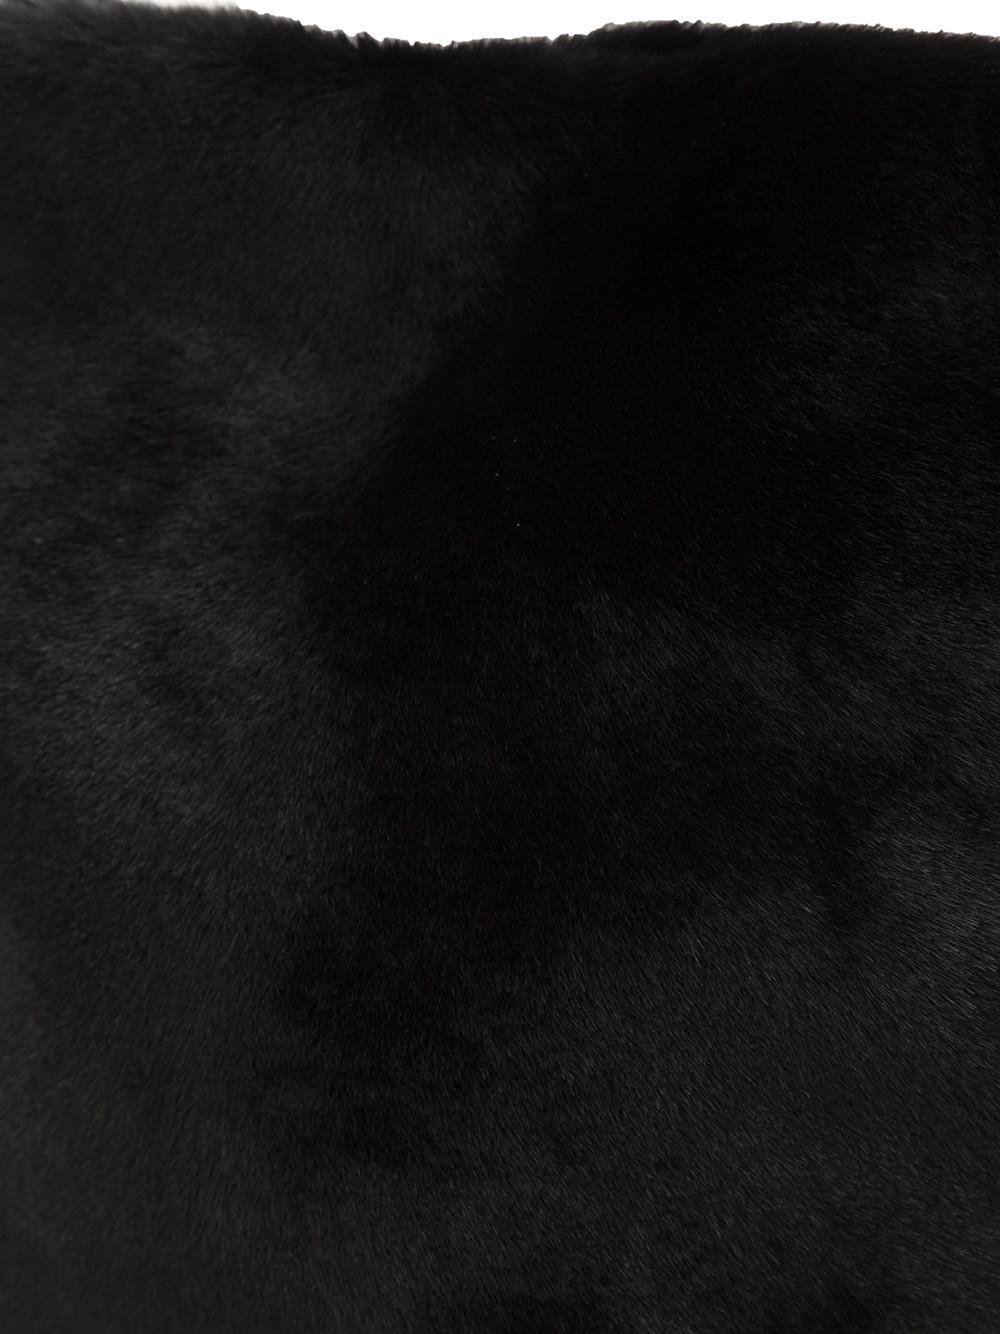 Ann Demeulemeester Nebula Small Leather Bag in Black